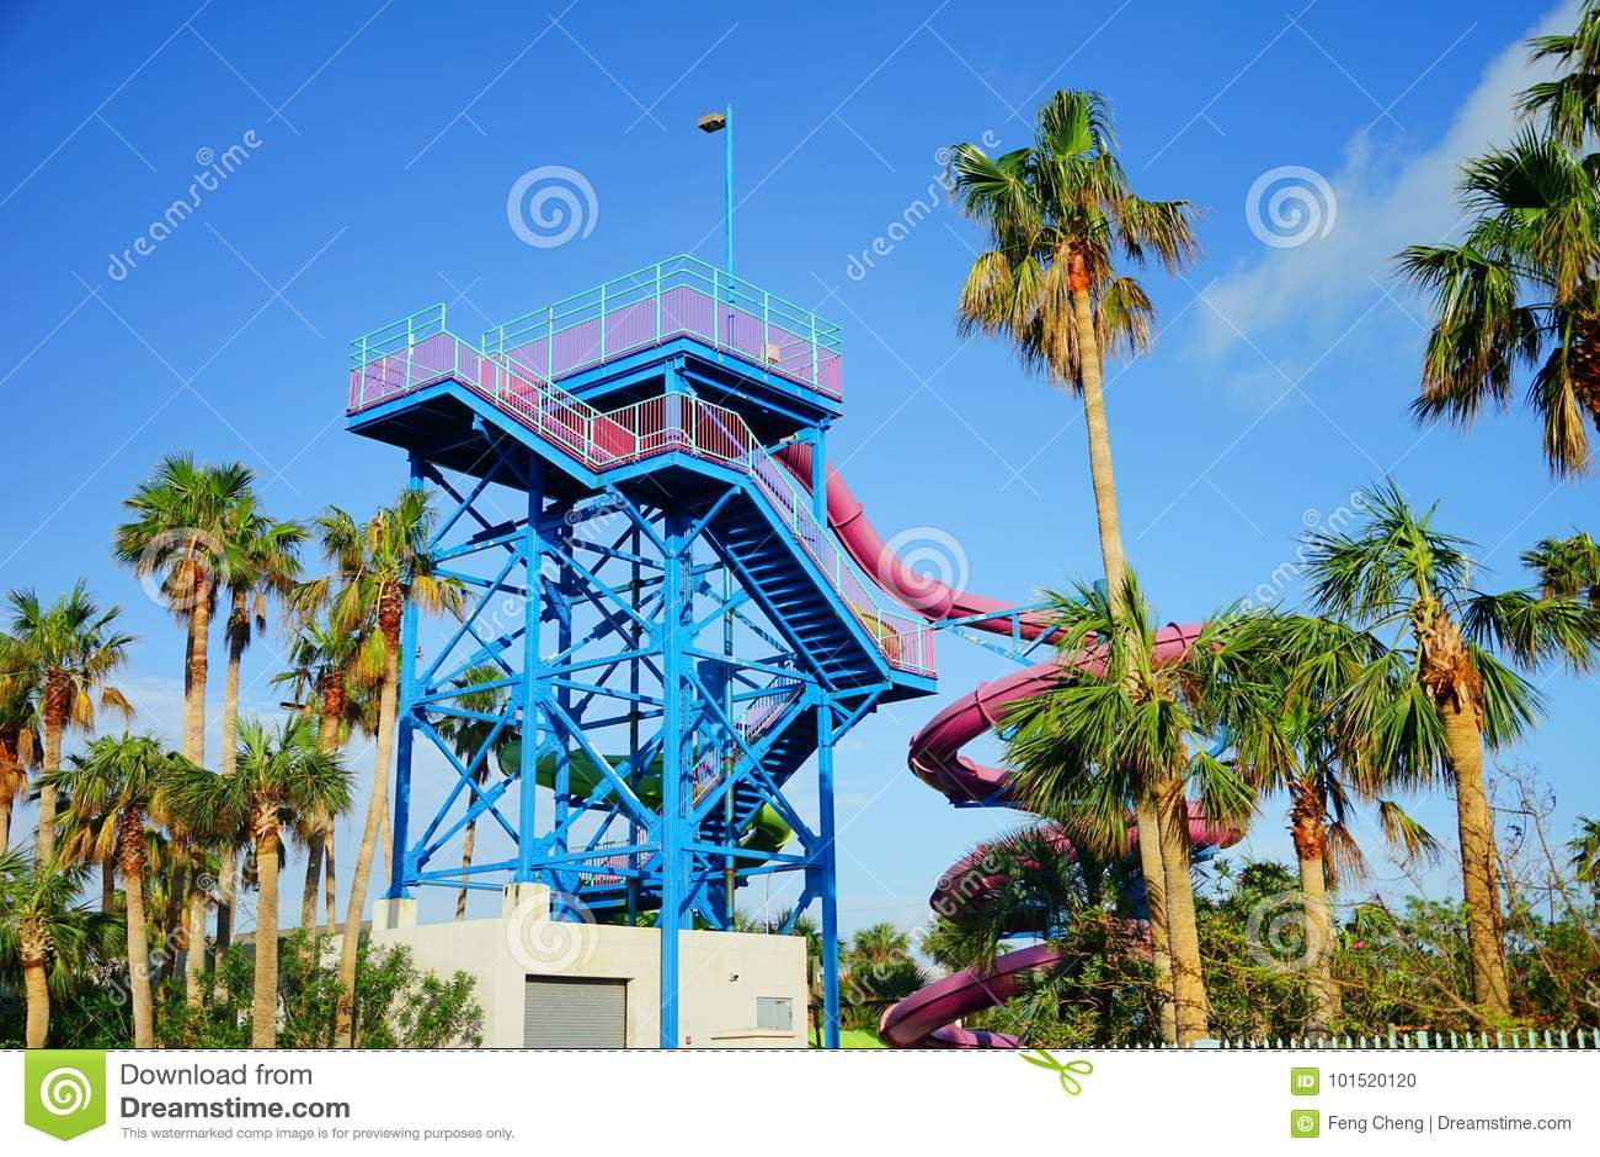 Daytona Beach recreation park